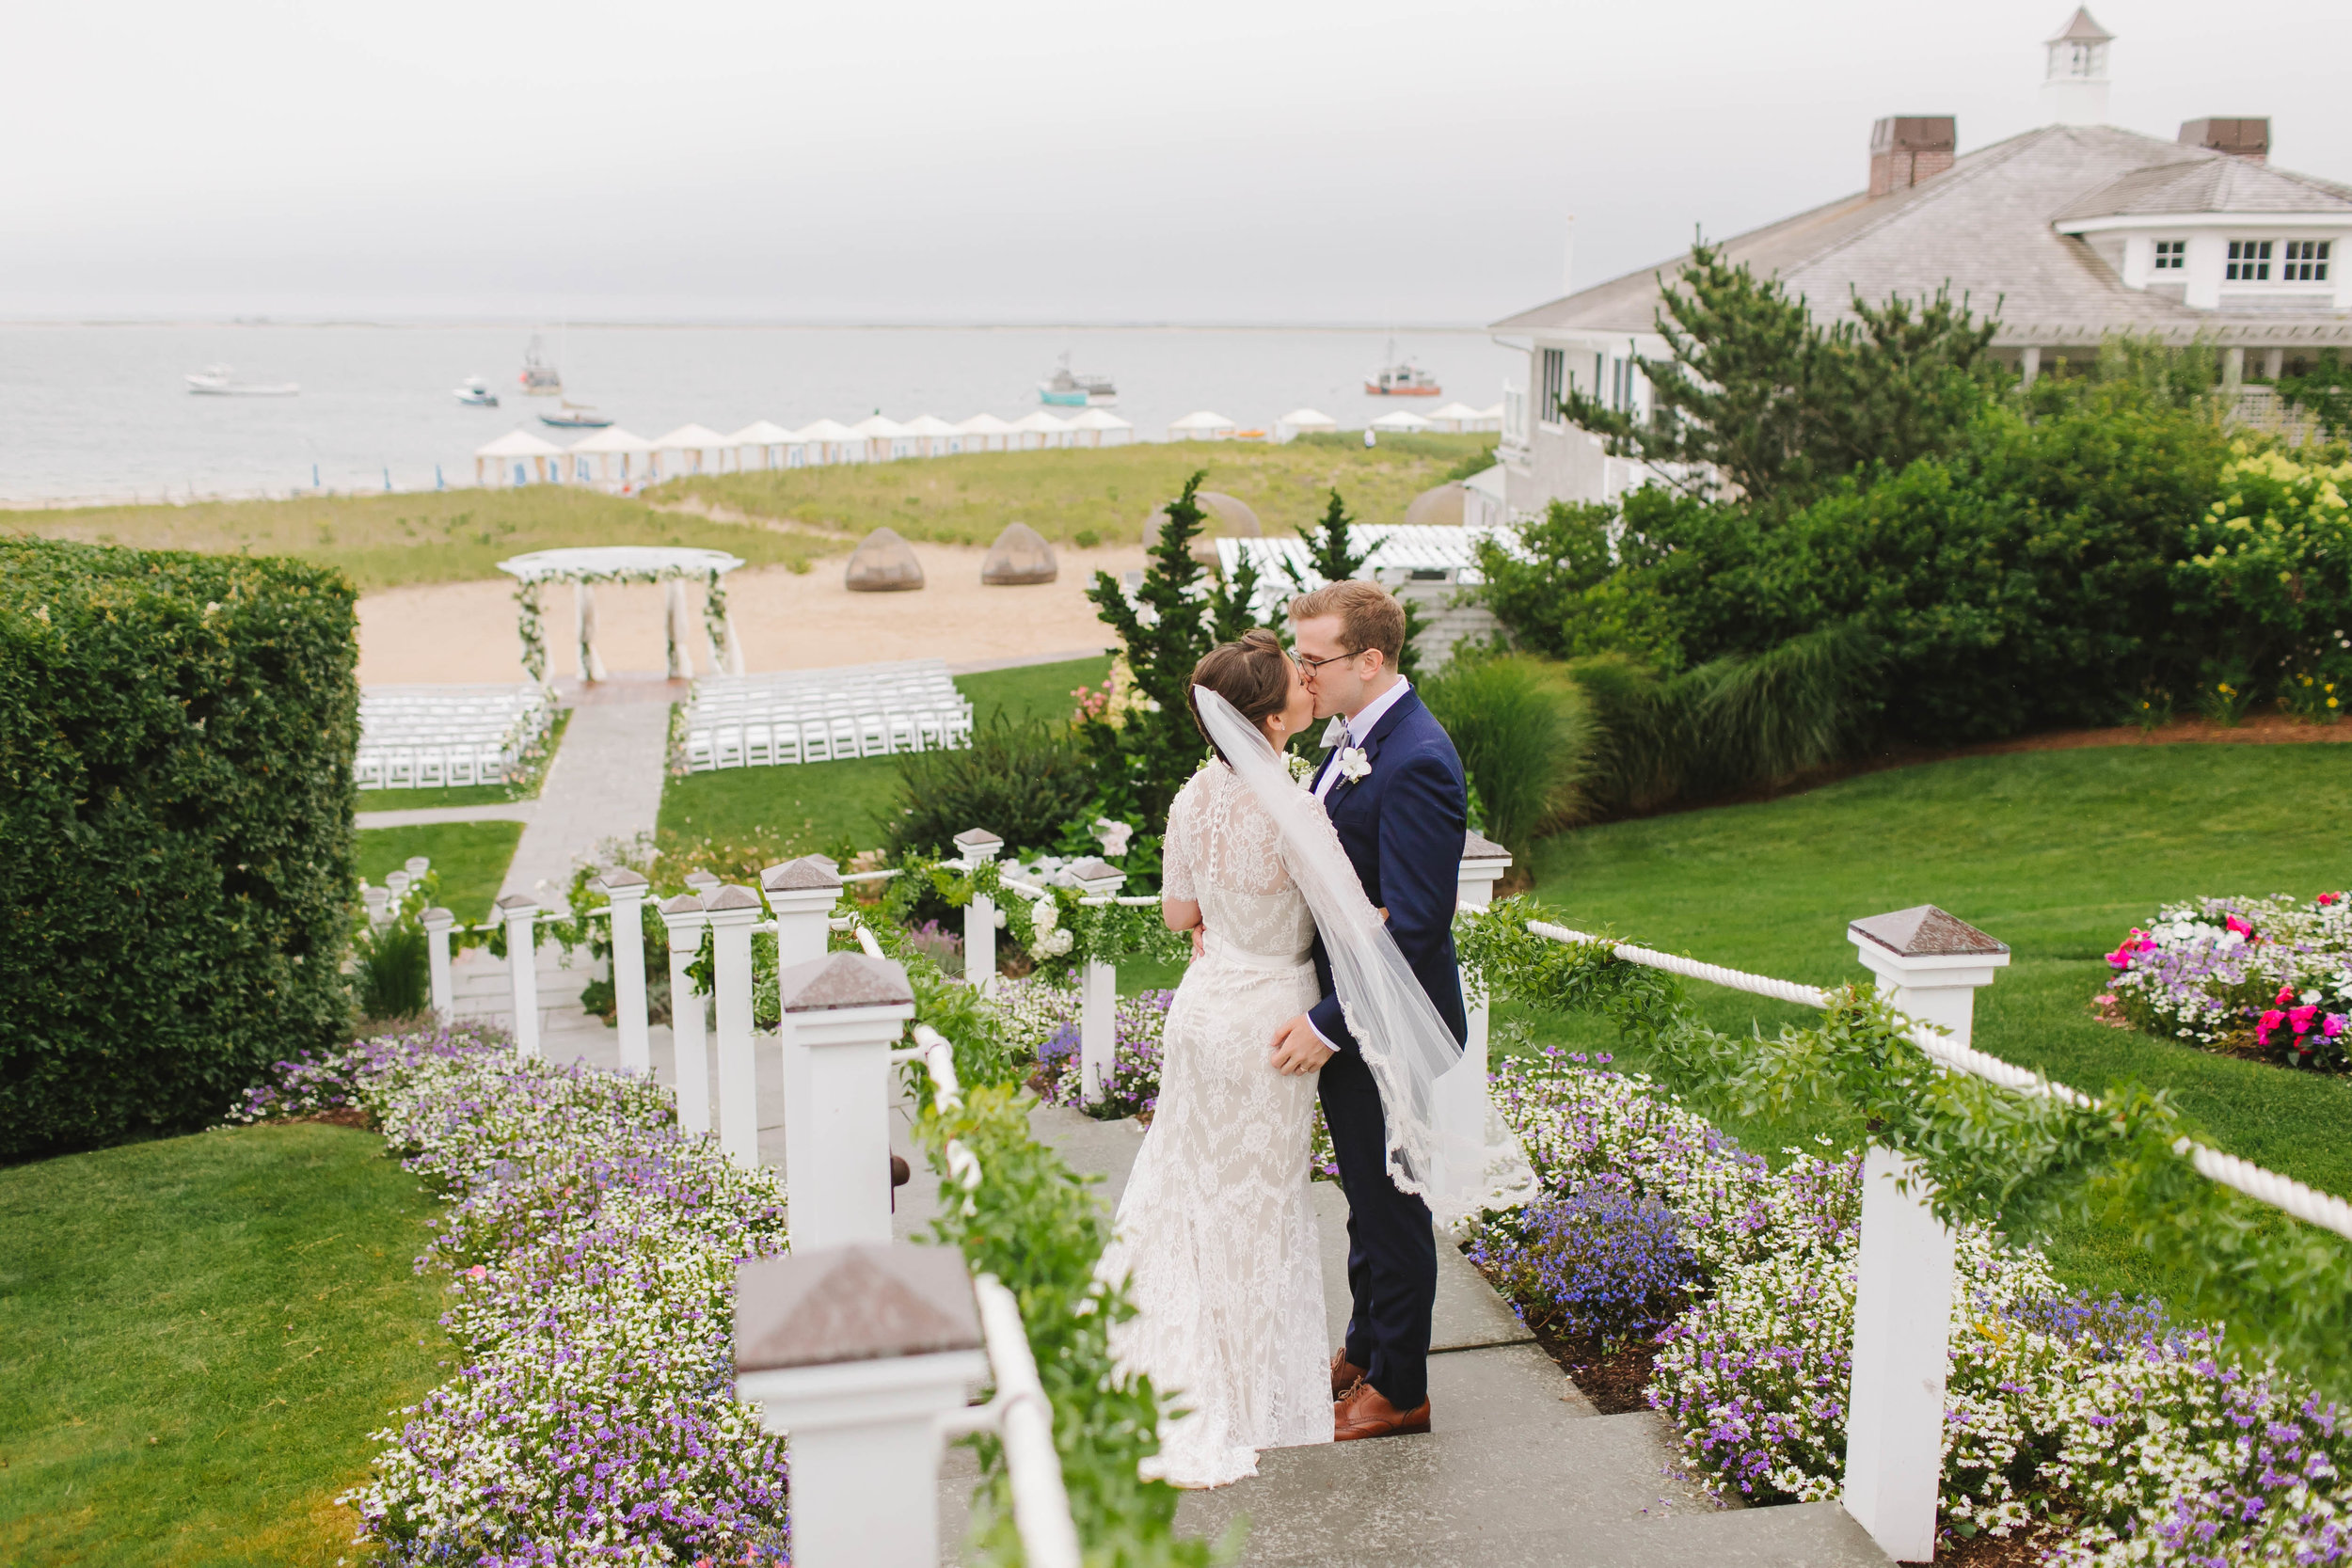 Chatham Bars Inn Cape Cod MA Rain Rainy Wedding with Dog - Emily Tebbetts Photography-4.jpg